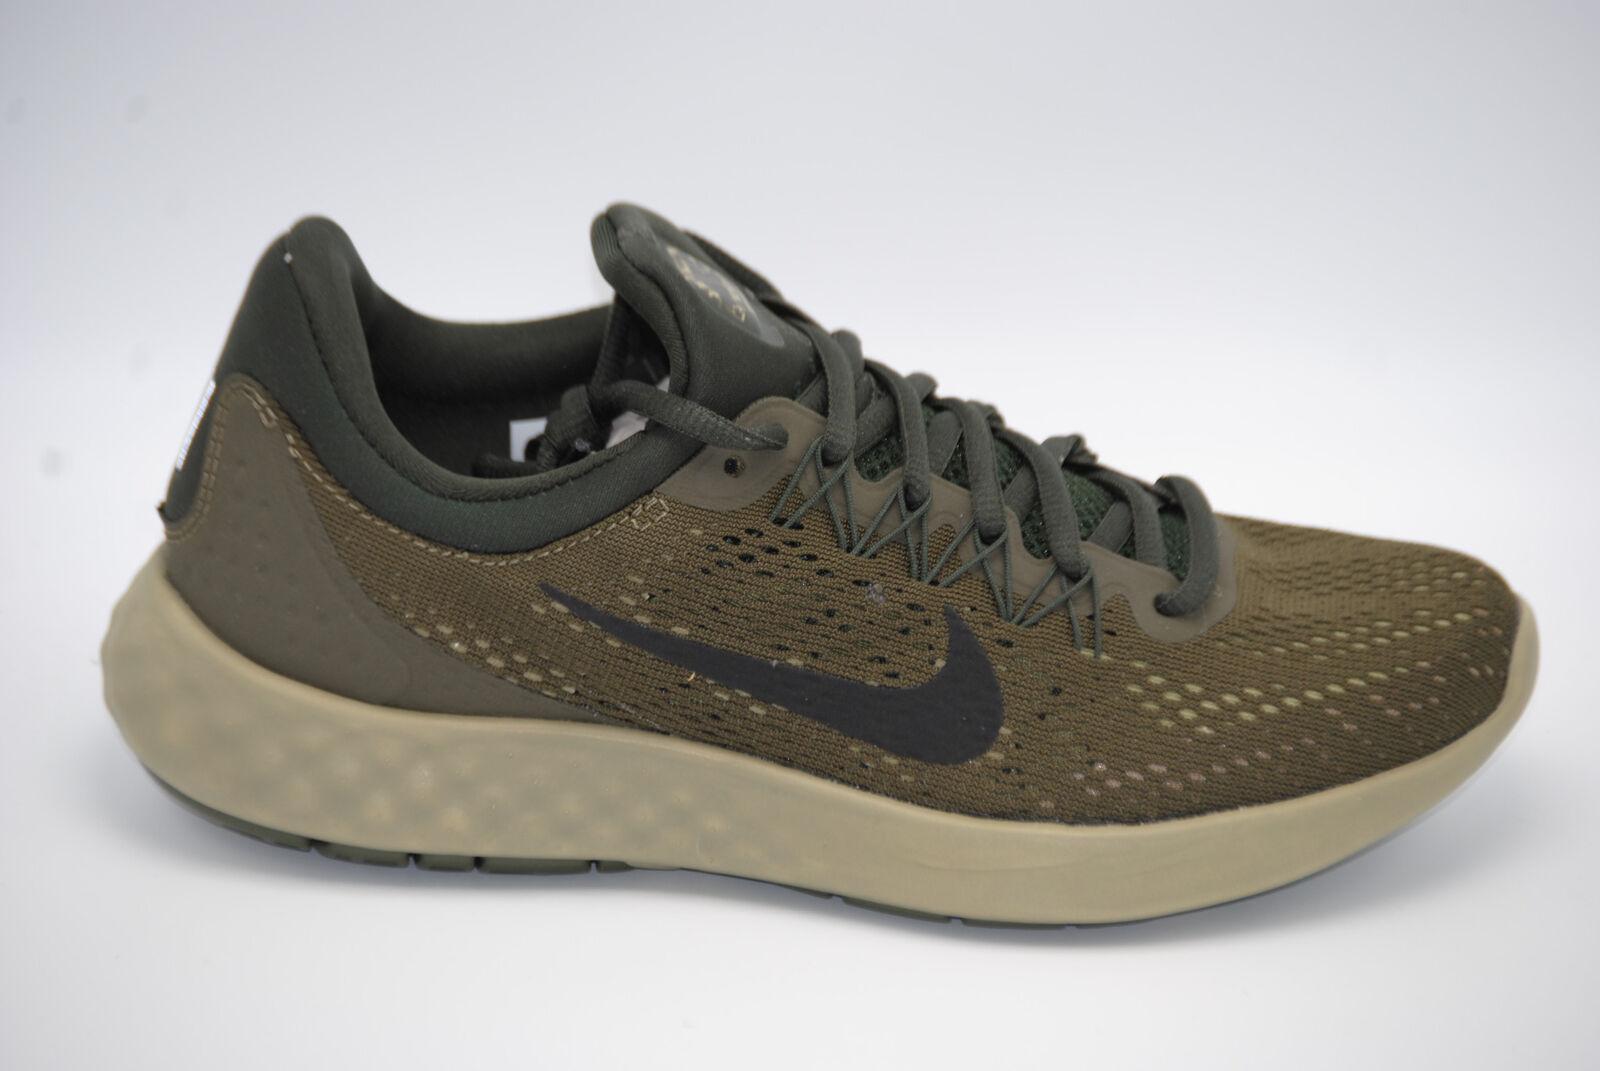 Nike Lunar Skyelux 855810-301 Loden Black Sequoia Womens Shoes